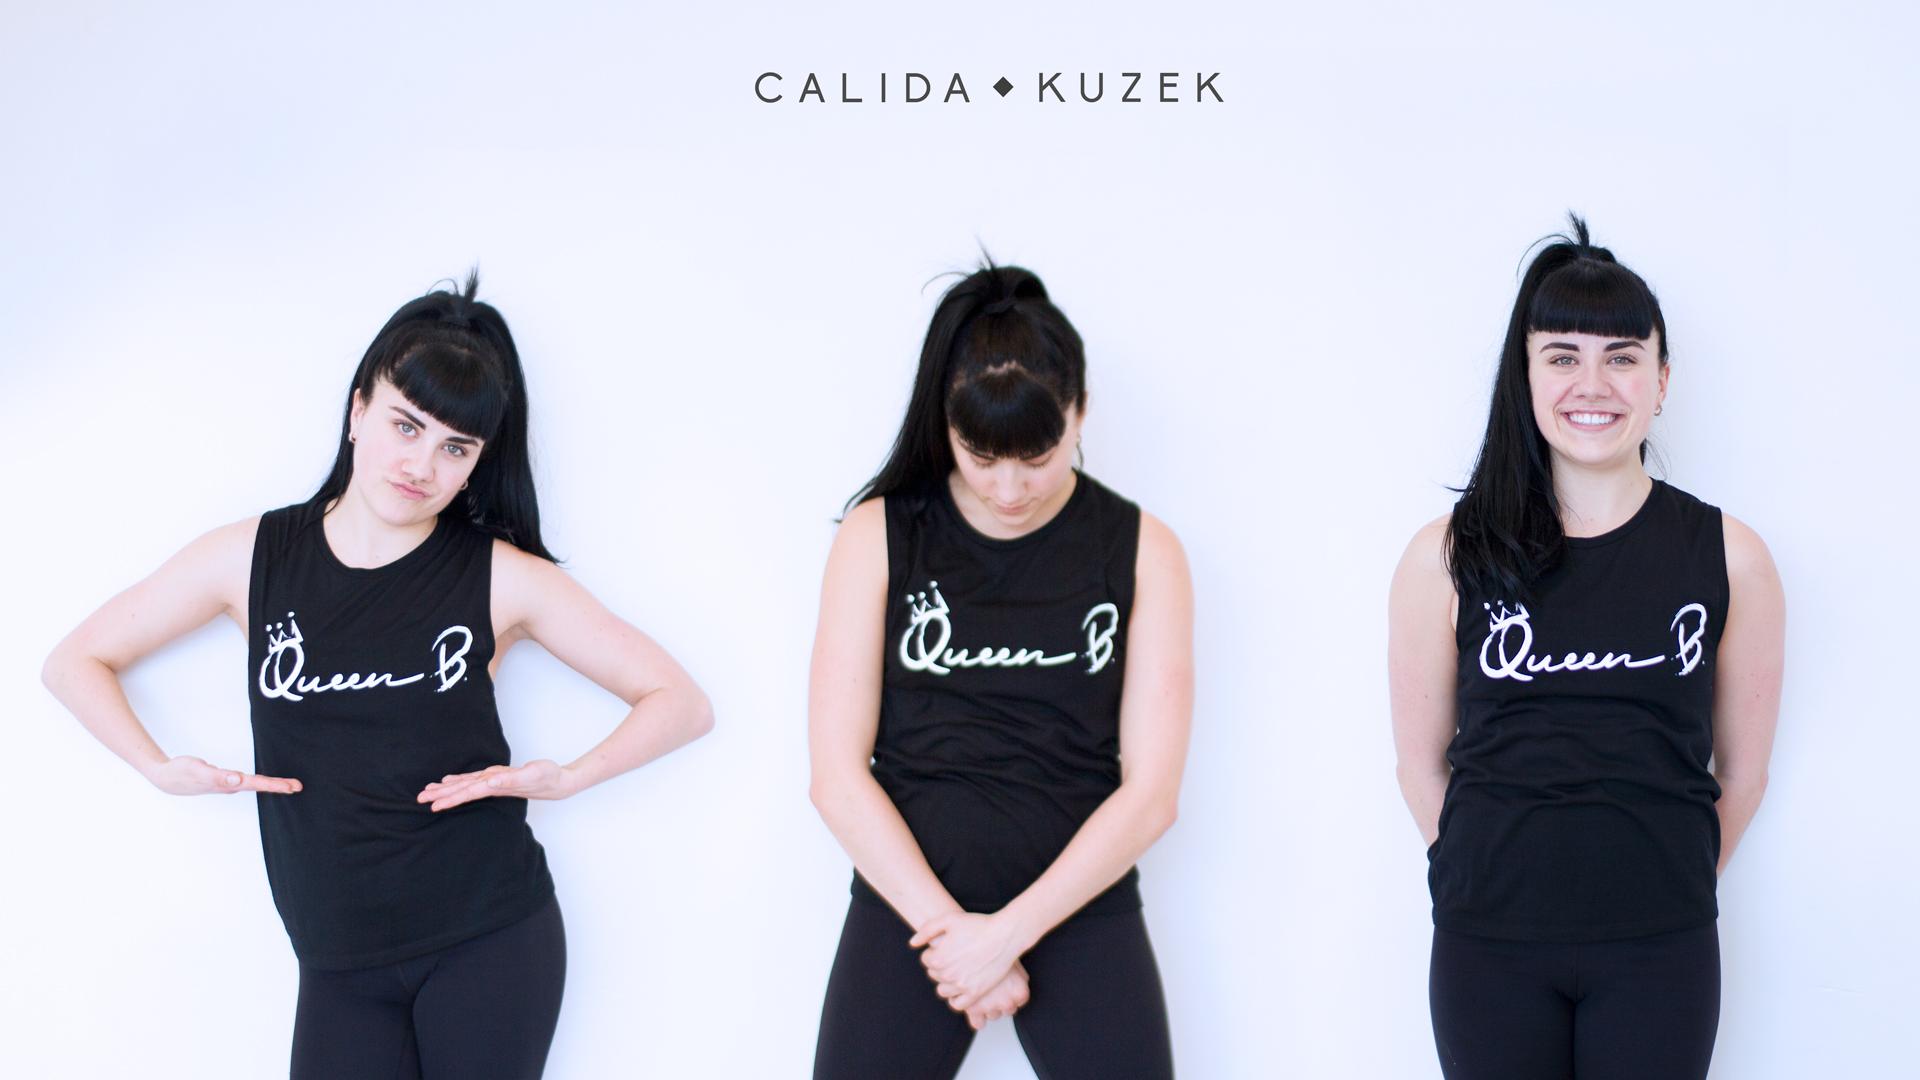 Calida Kuzek